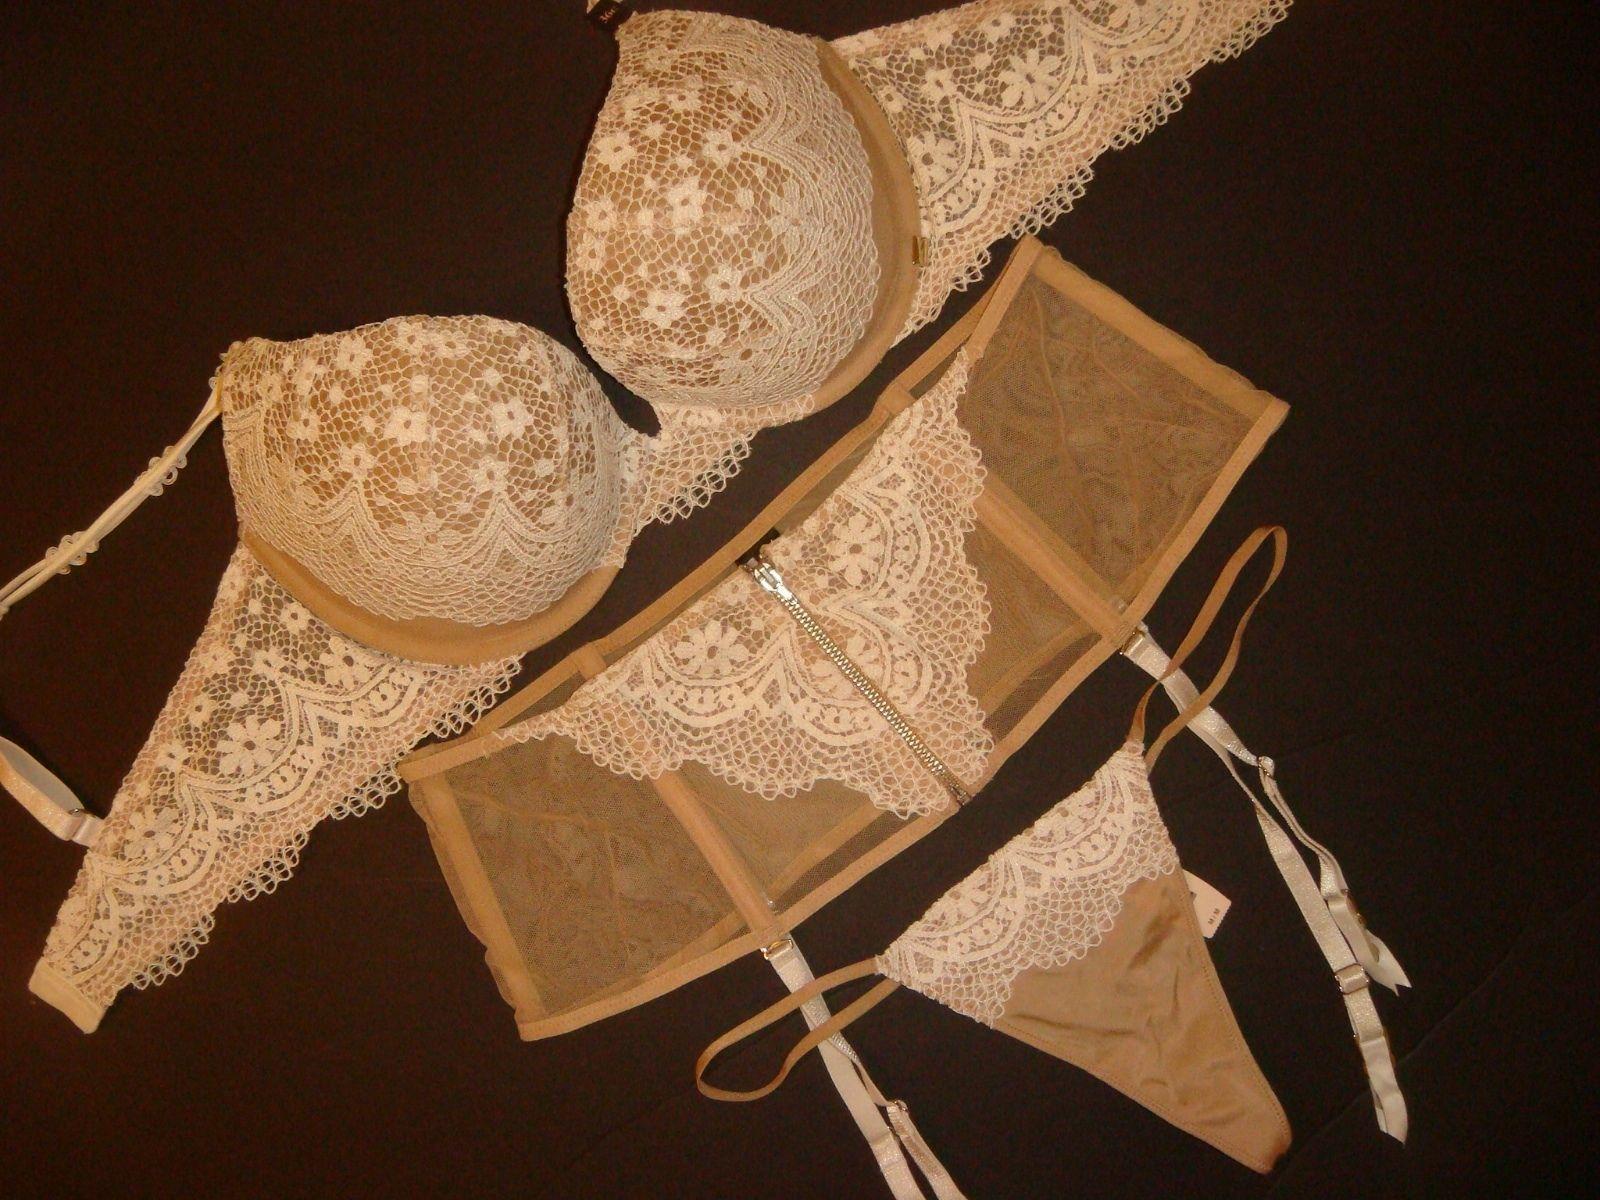 f5c483f74cb4f Victoria s Secret Bra Set+Garter 32D and 50 similar items. S l1600